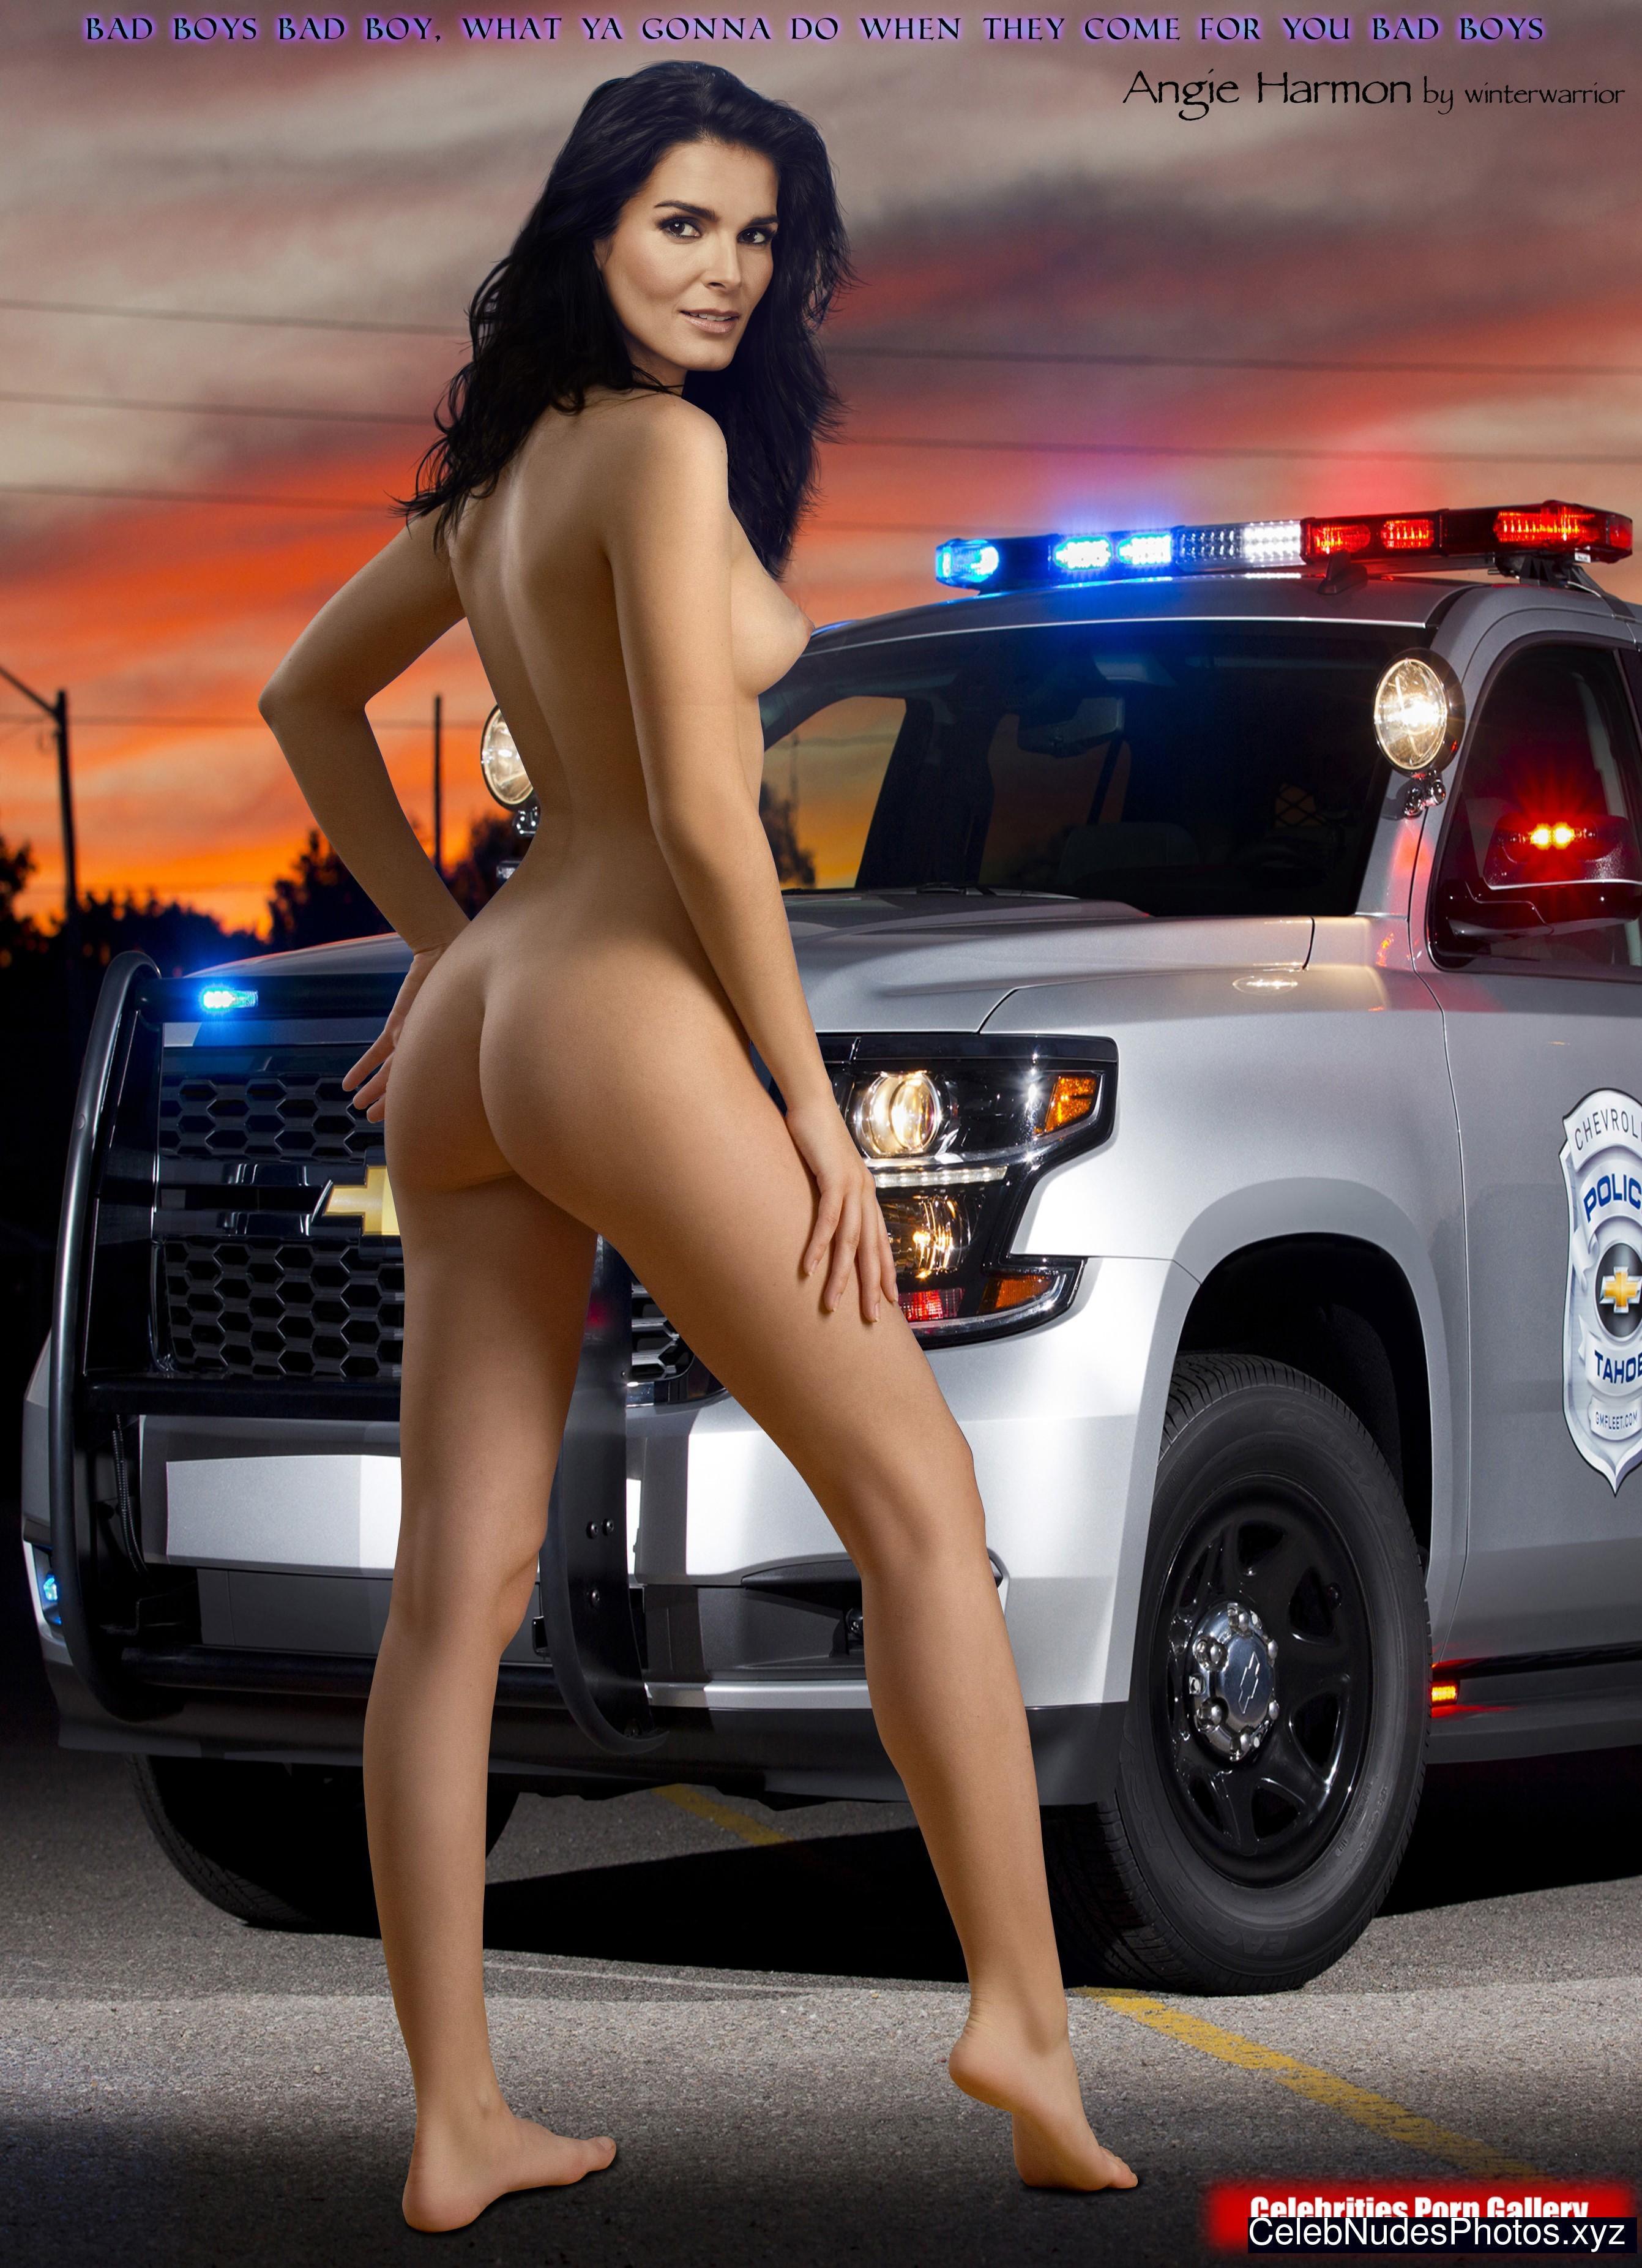 Angie Harmon Nuda angie harmon nude celebrity pictures - celeb nudes photos